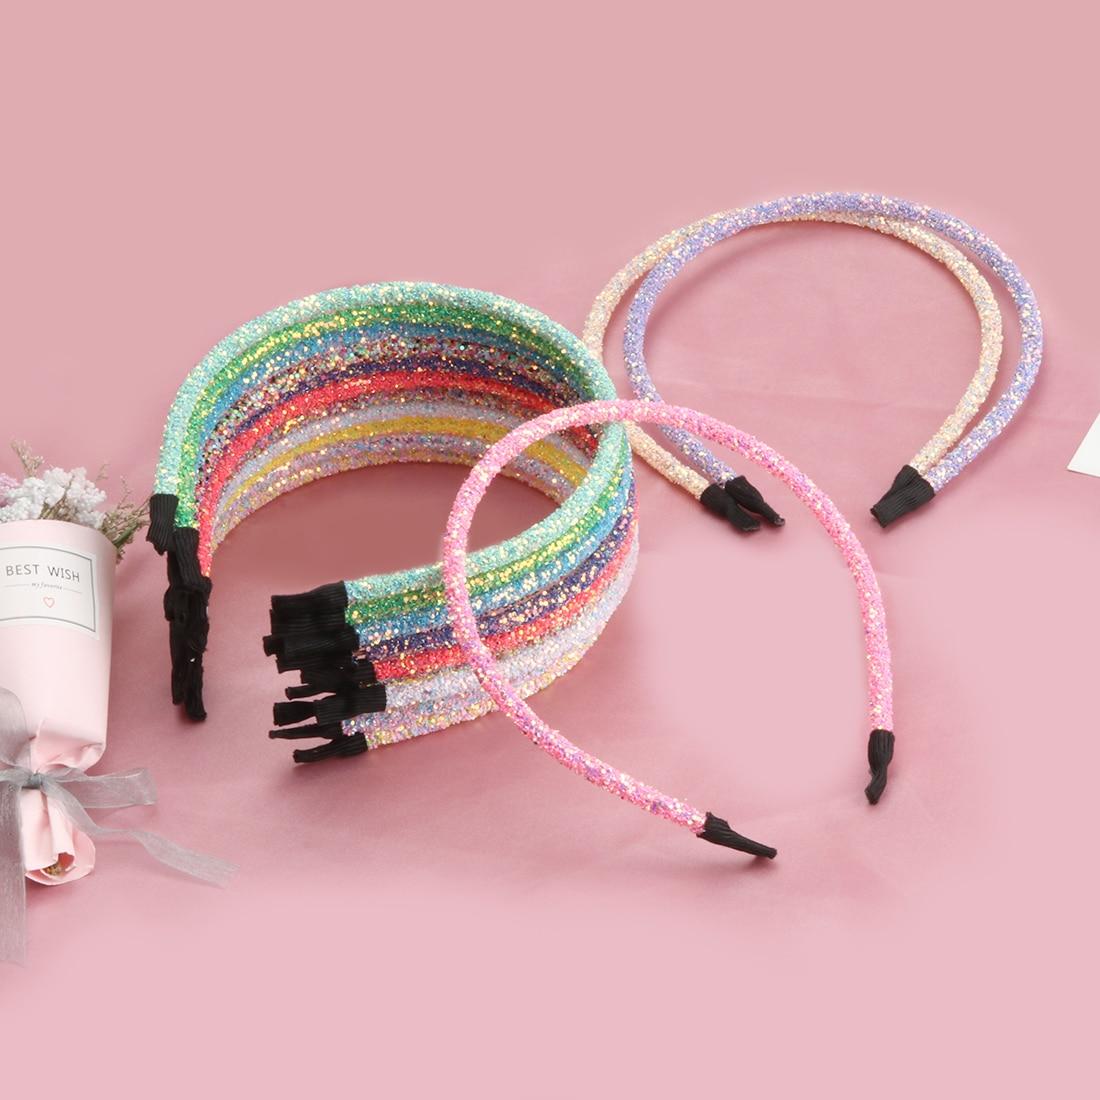 Diadema con brillo para niñas de 14 unids/lote, diademas de moda para fiestas infantiles con lentejuelas ostentosas, accesorios para el cabello para niños